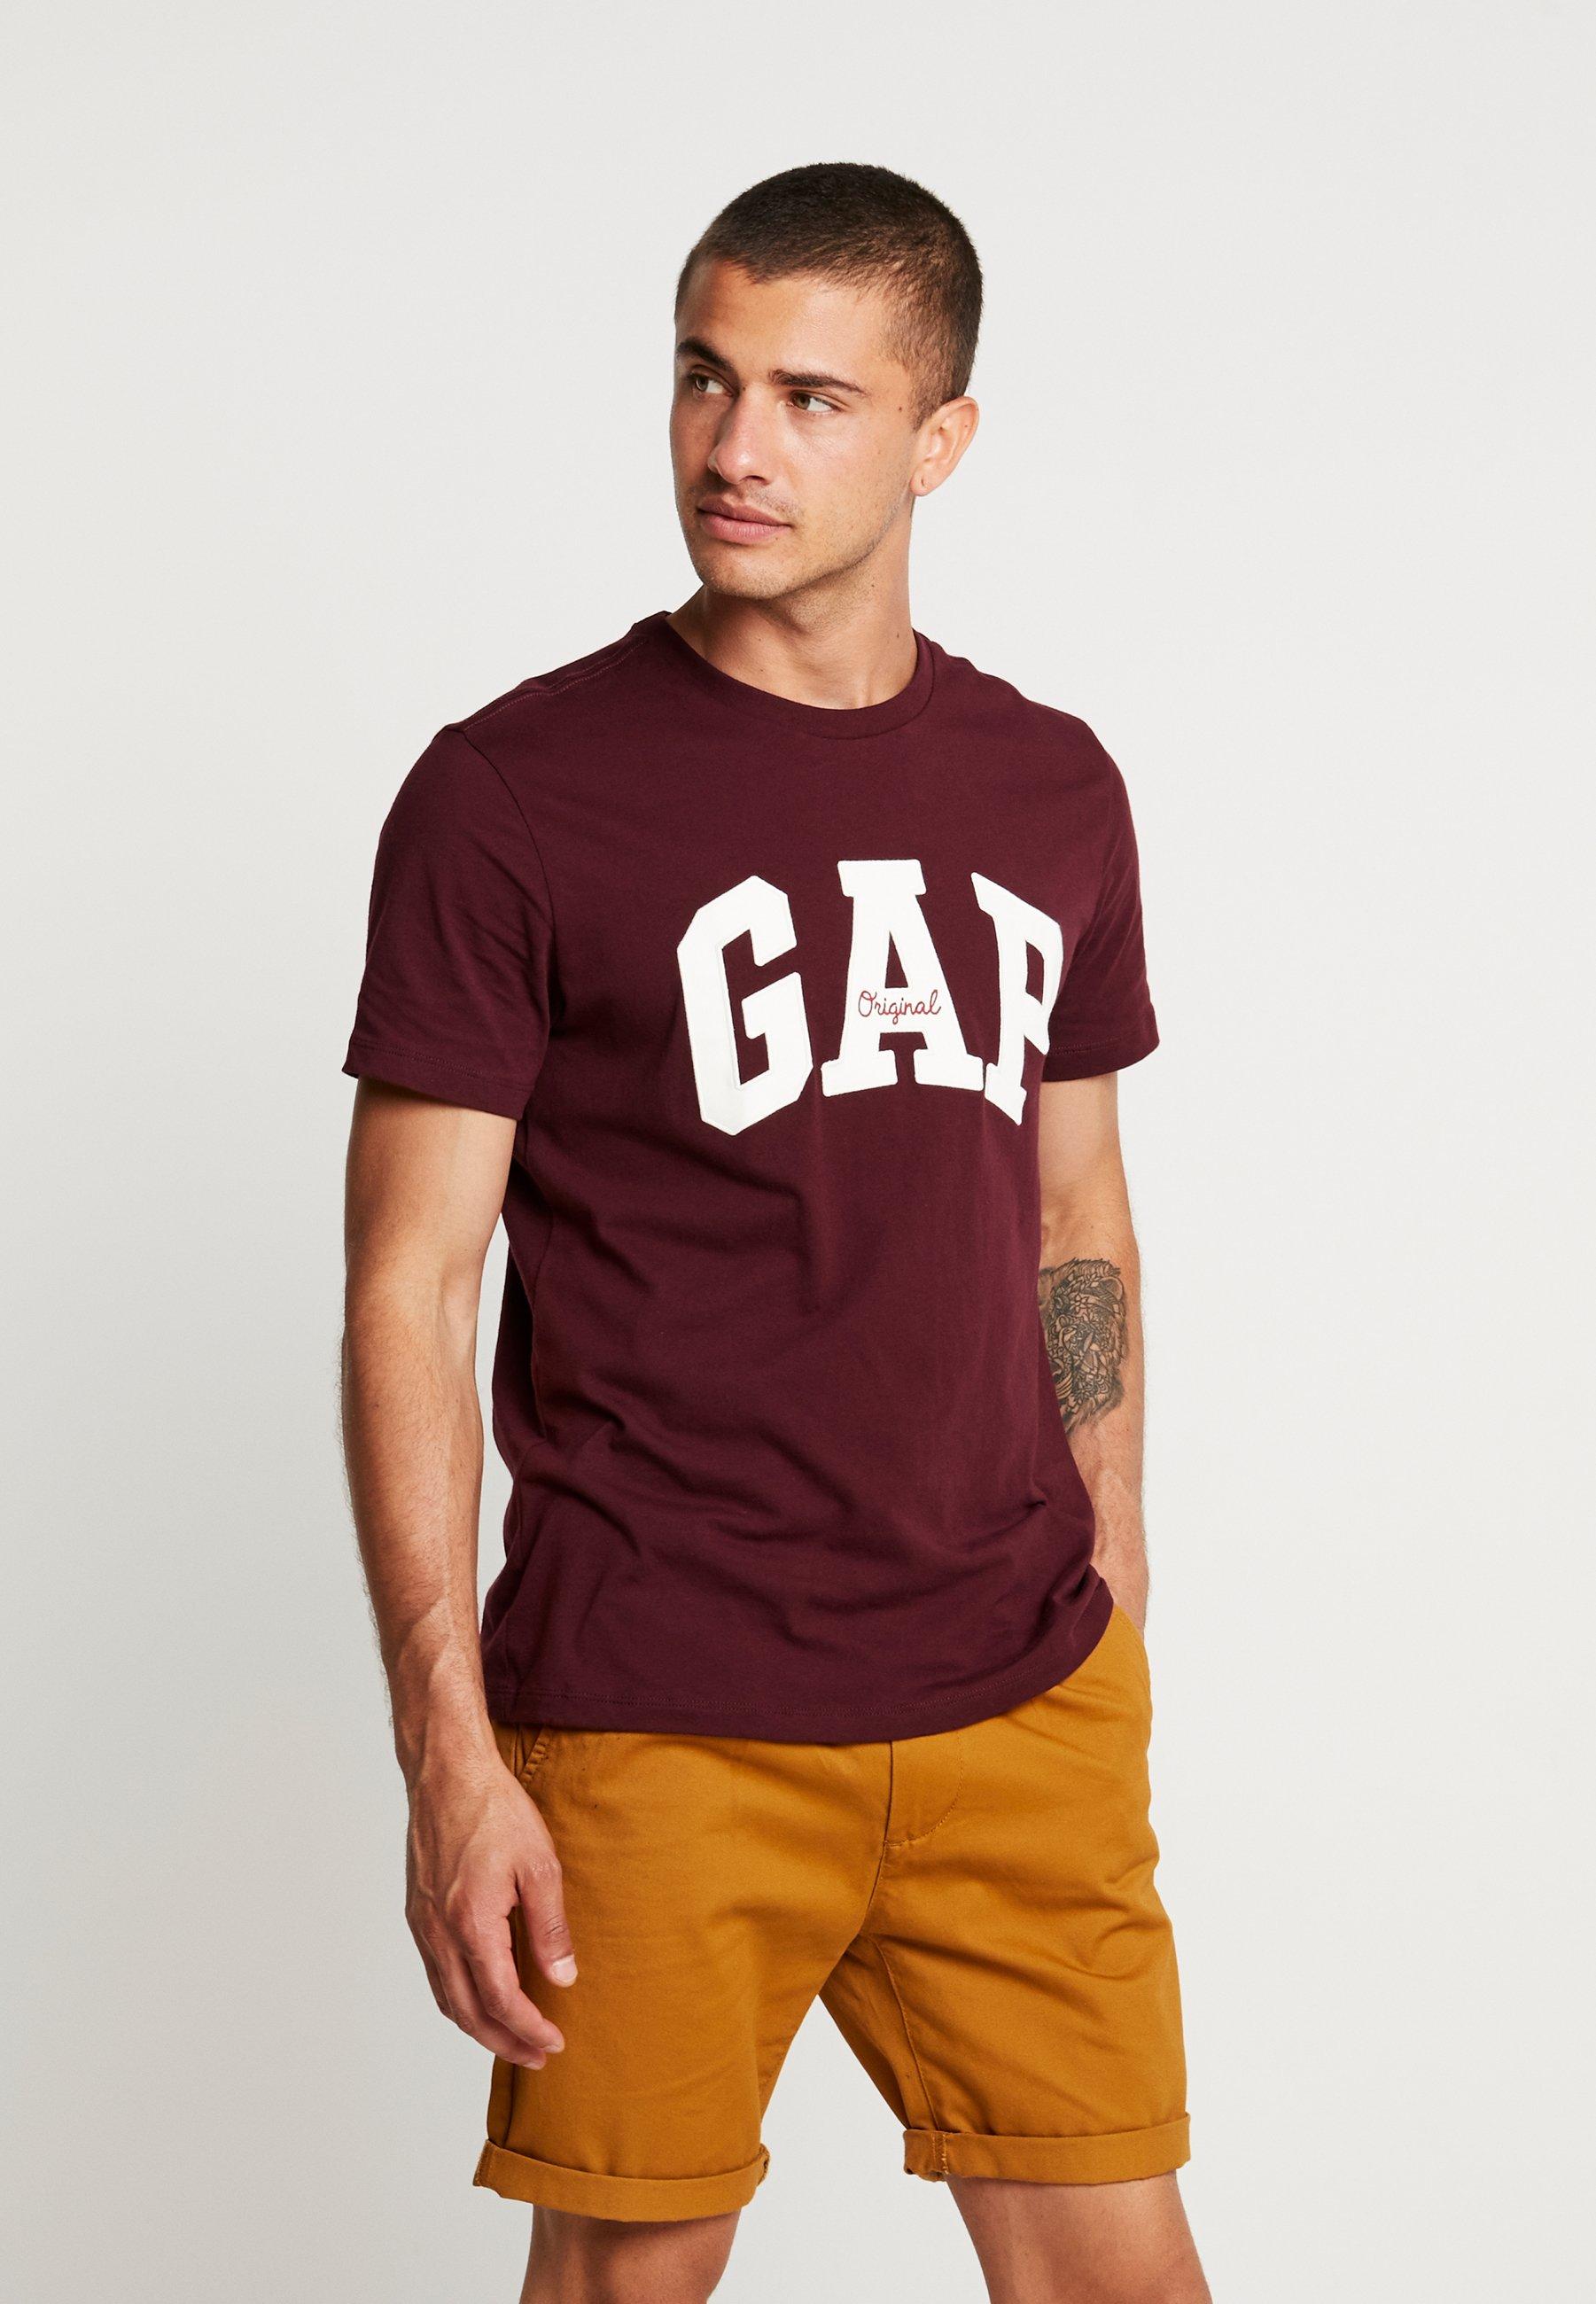 ArchT Pinot Gap Imprimé Noir Orig shirt dCxoBreW